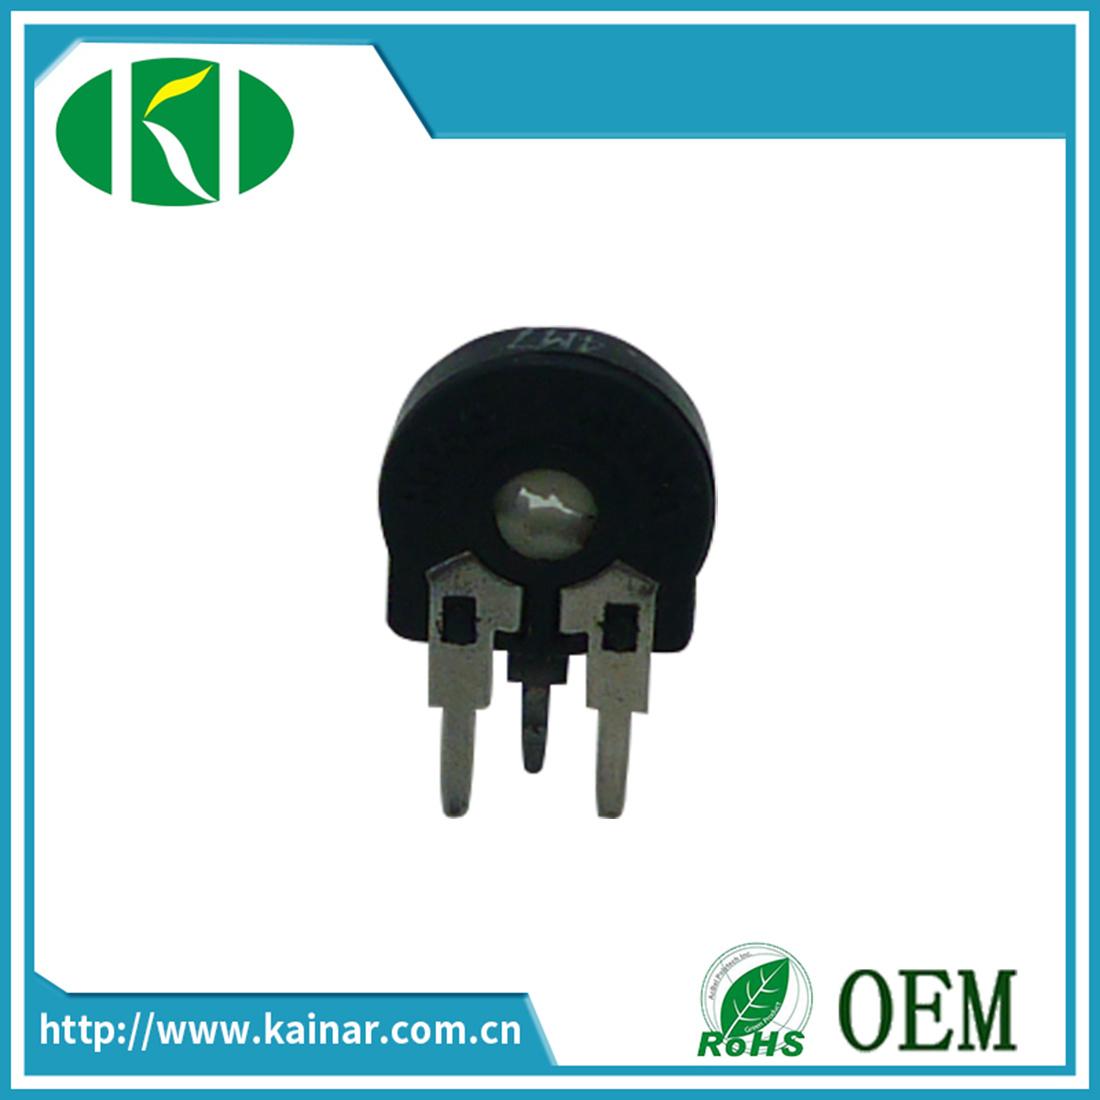 10mm Rotary Trimmer Potentiometer Piher Spain PT10-1